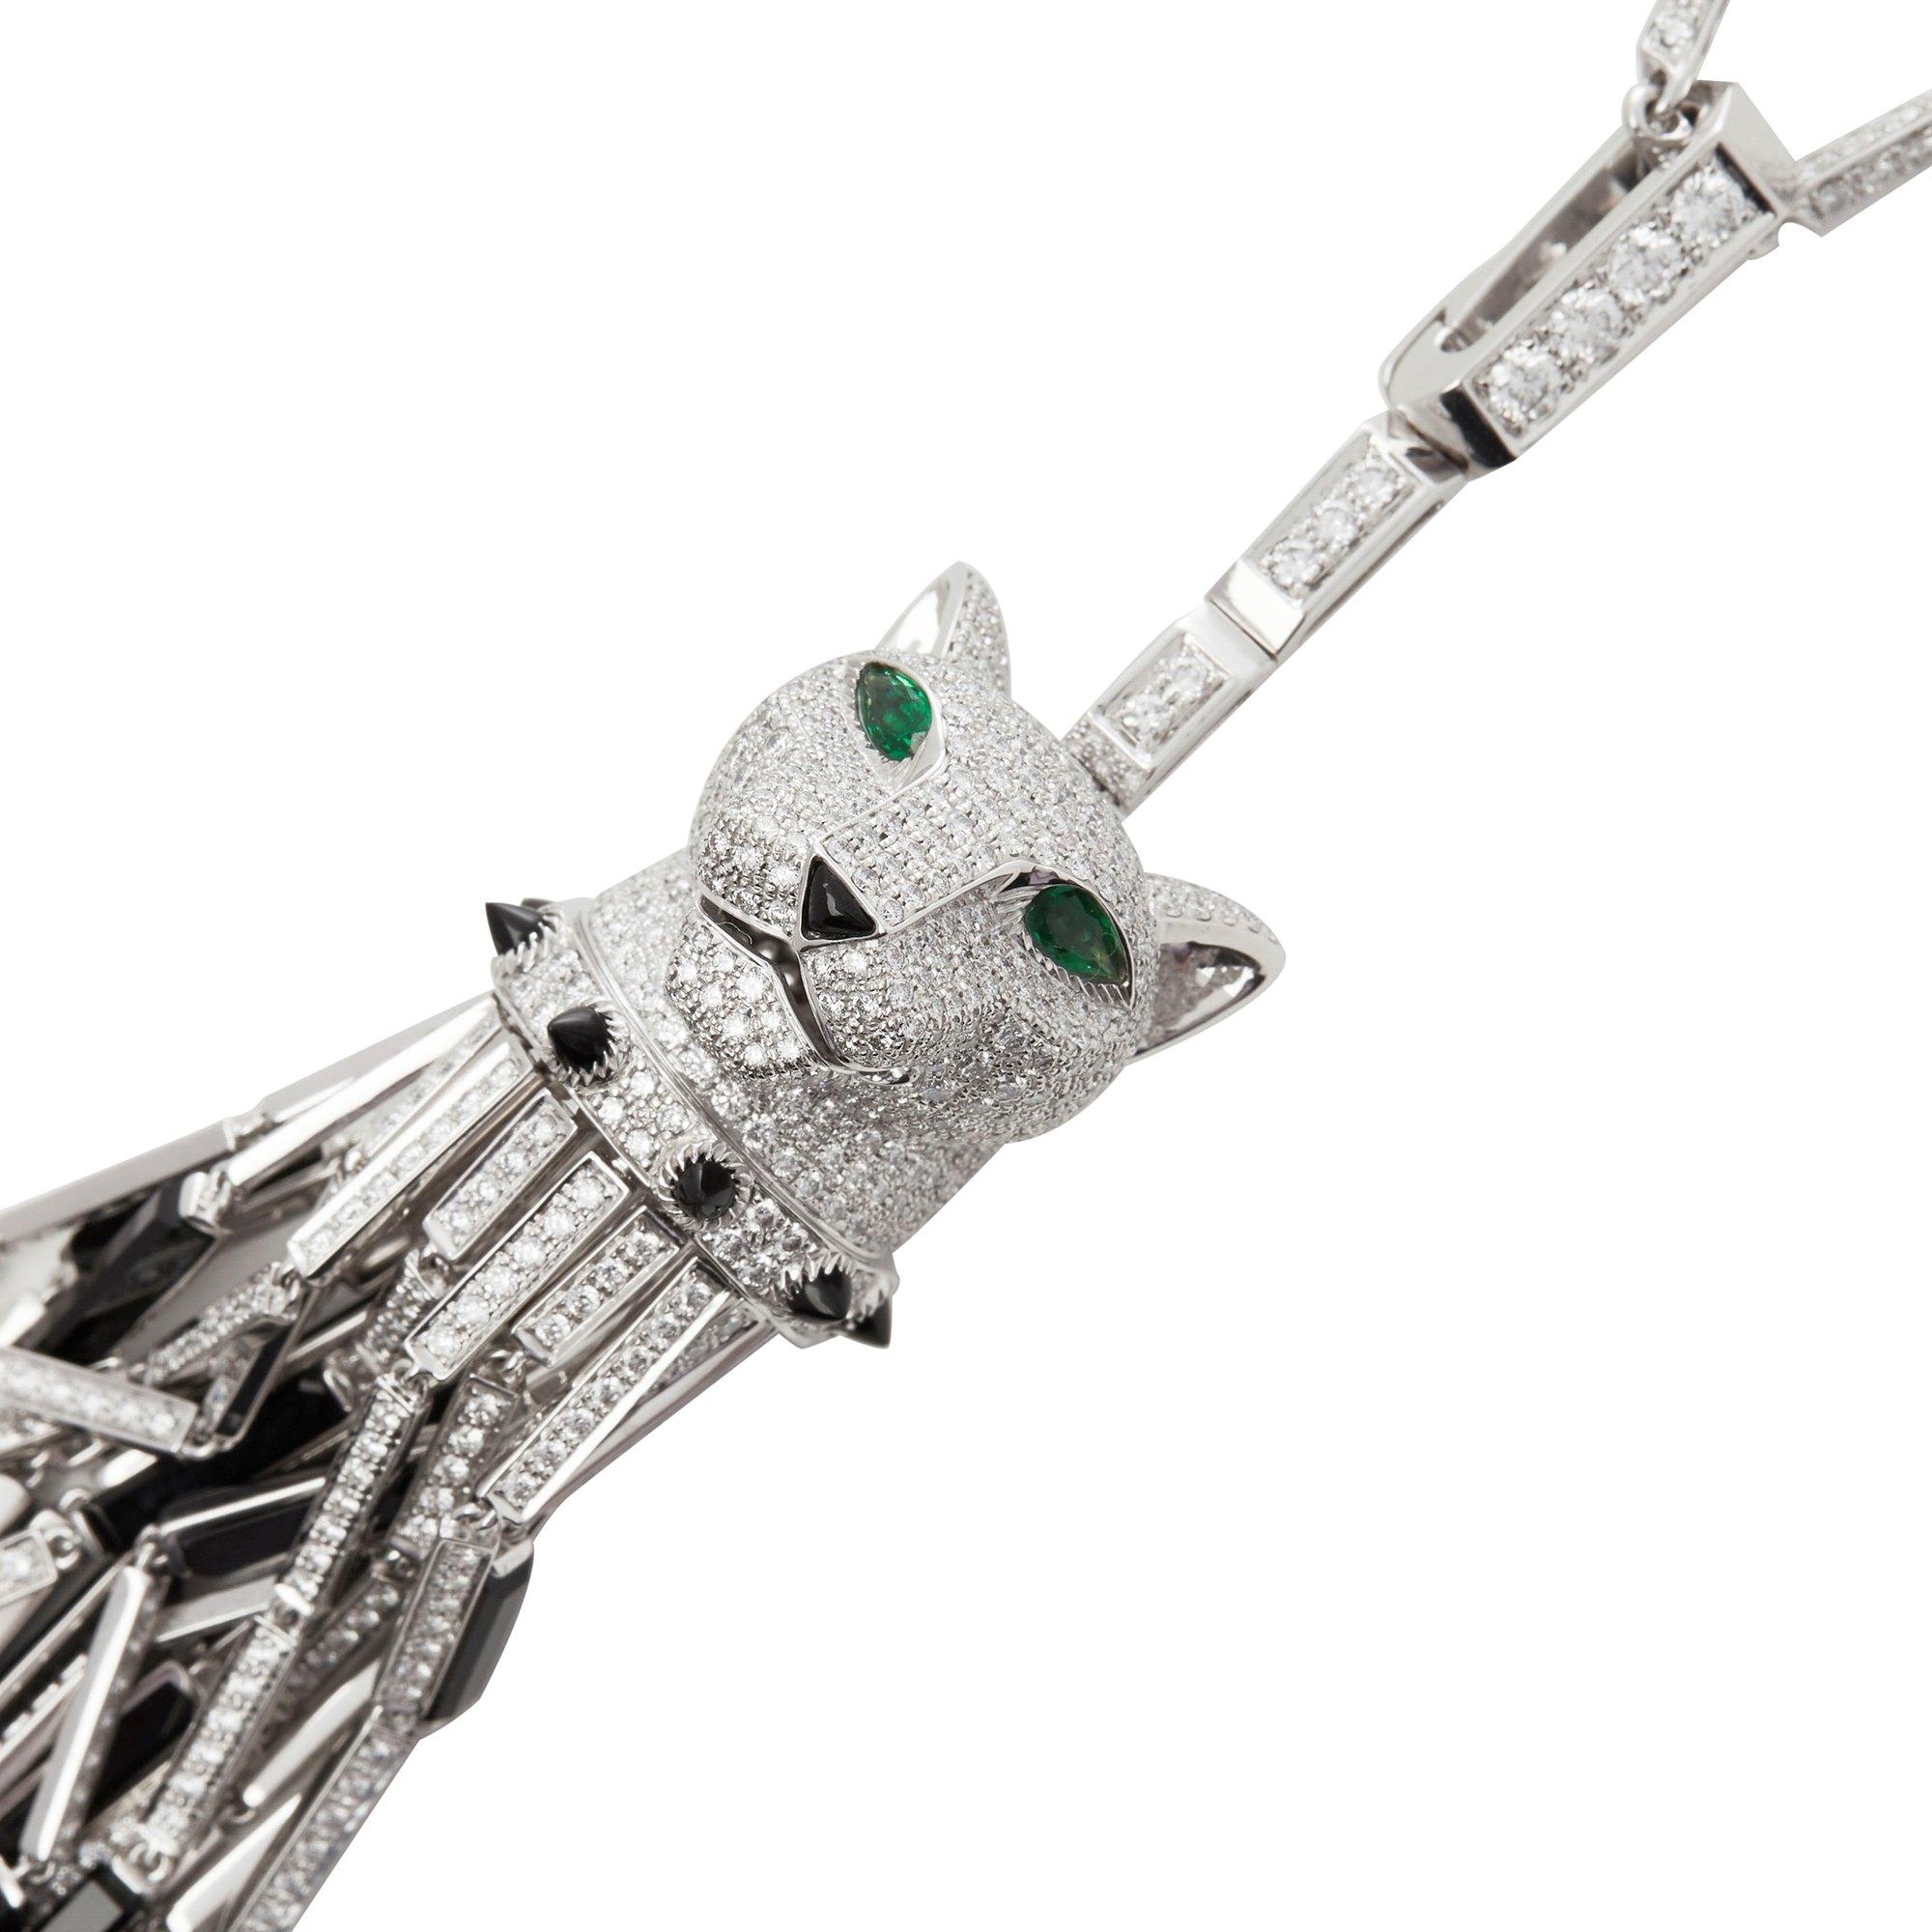 Cartier 18k White Gold Diamond, Emerald & Onyx Panthère Pendant Necklace